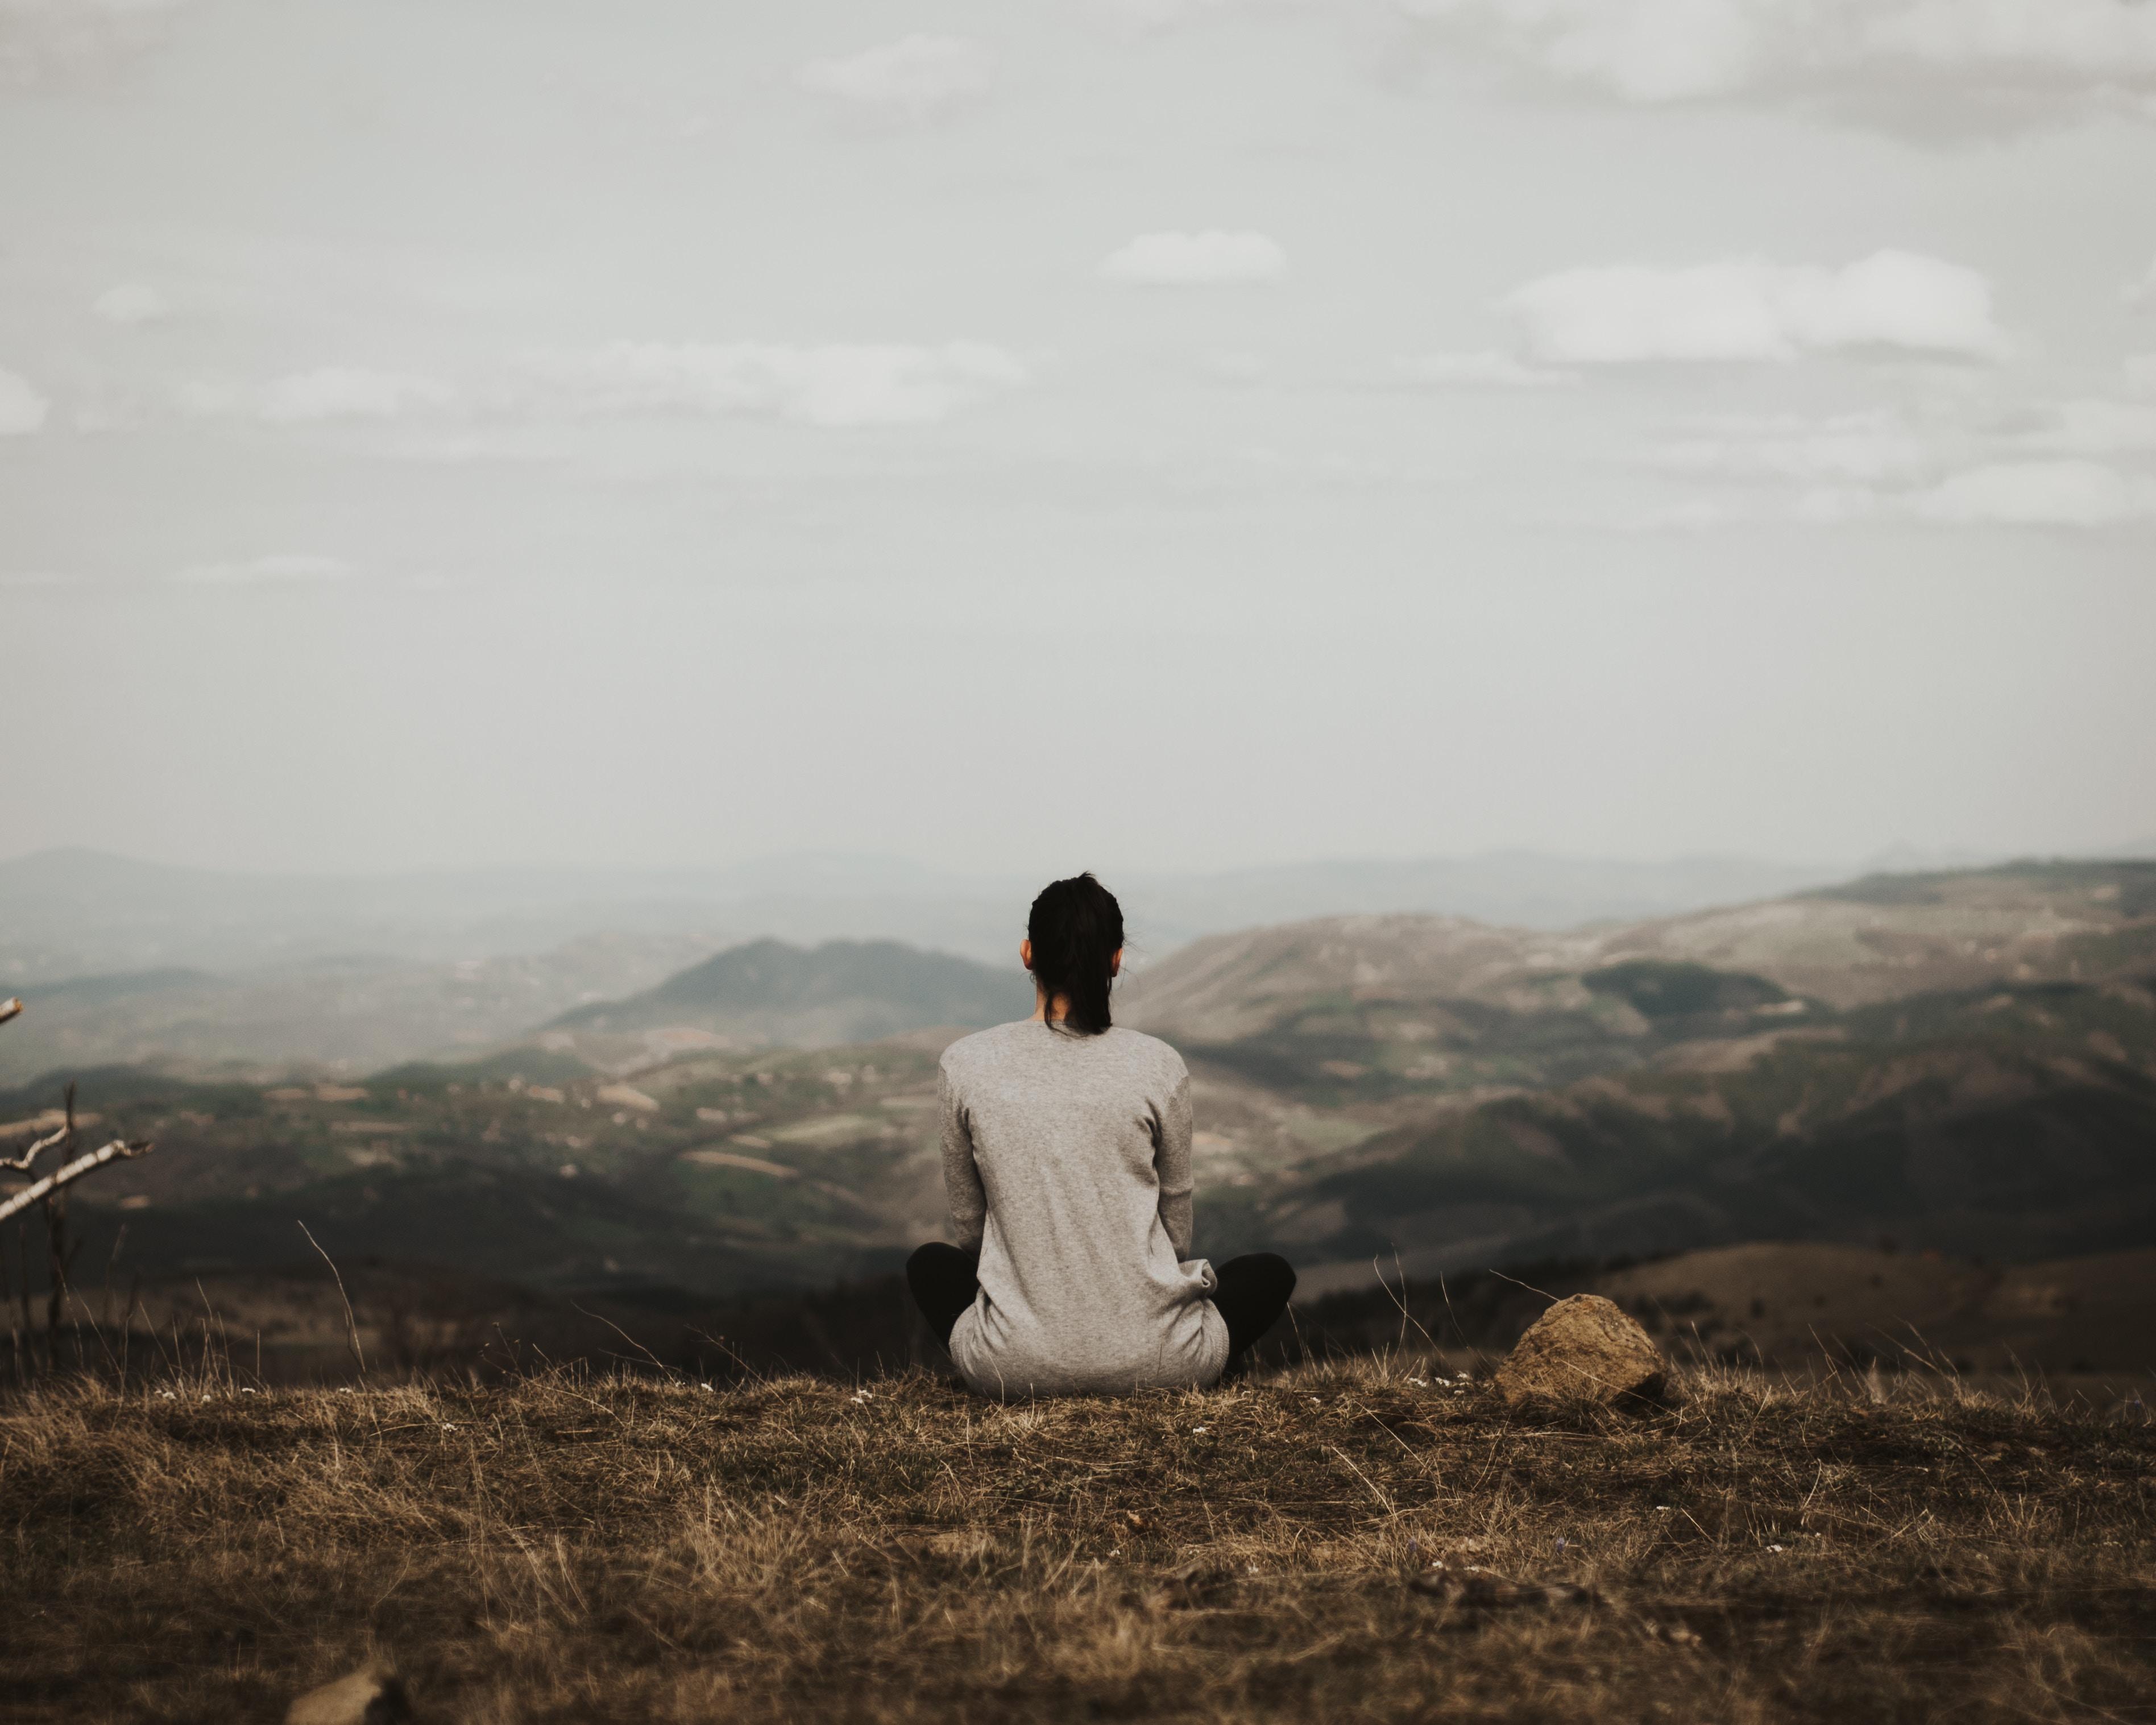 Mindfulness meditation | Photo by Milan Popovic on Unsplash